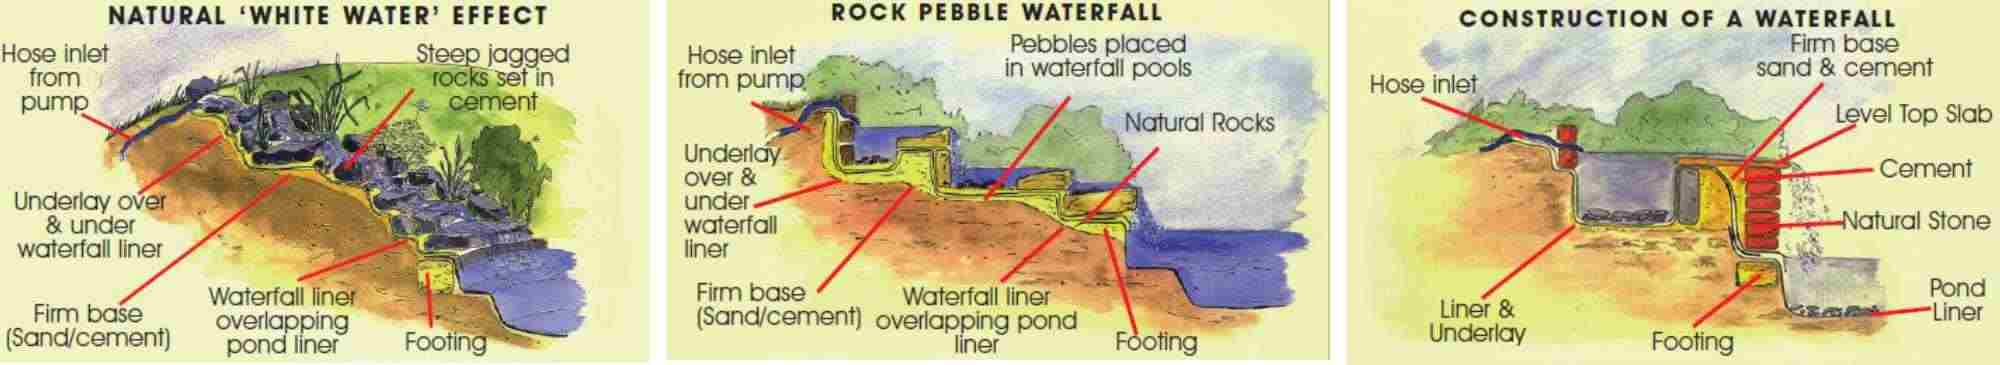 waterfall-ideas-for-self-build.jpg